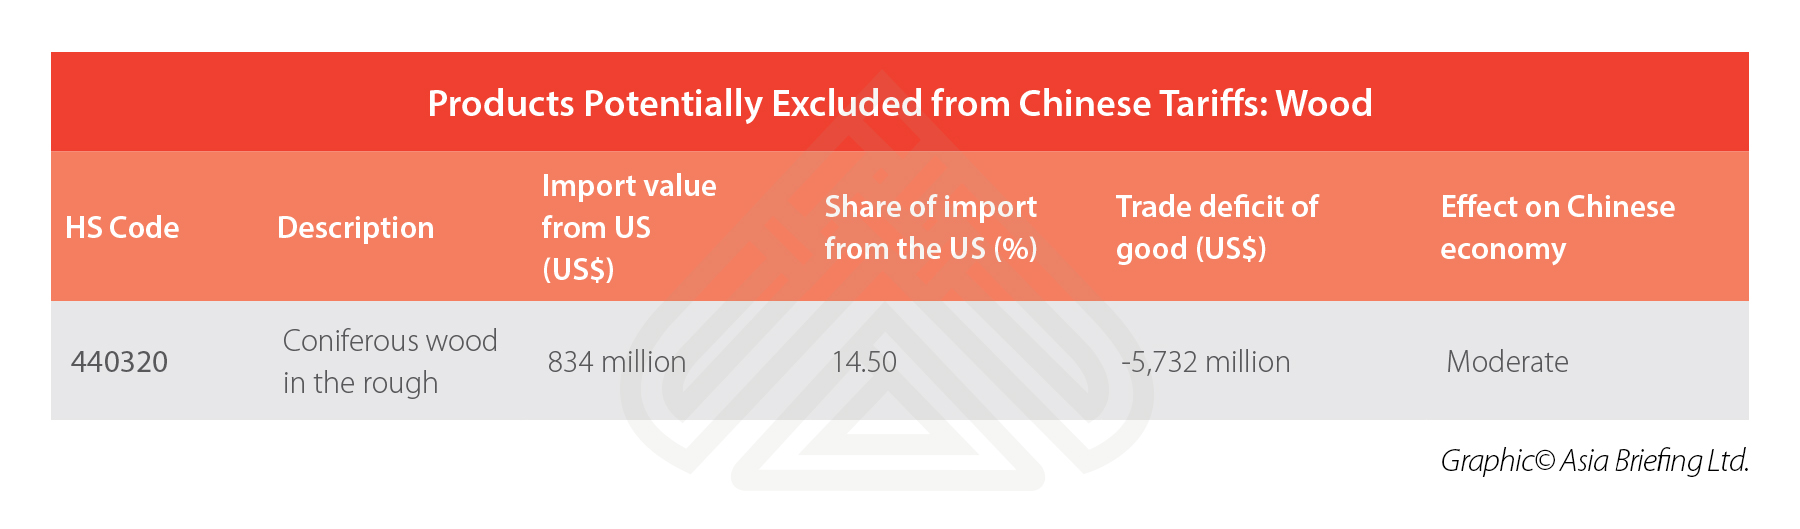 china-wood-imports-US-tariffs